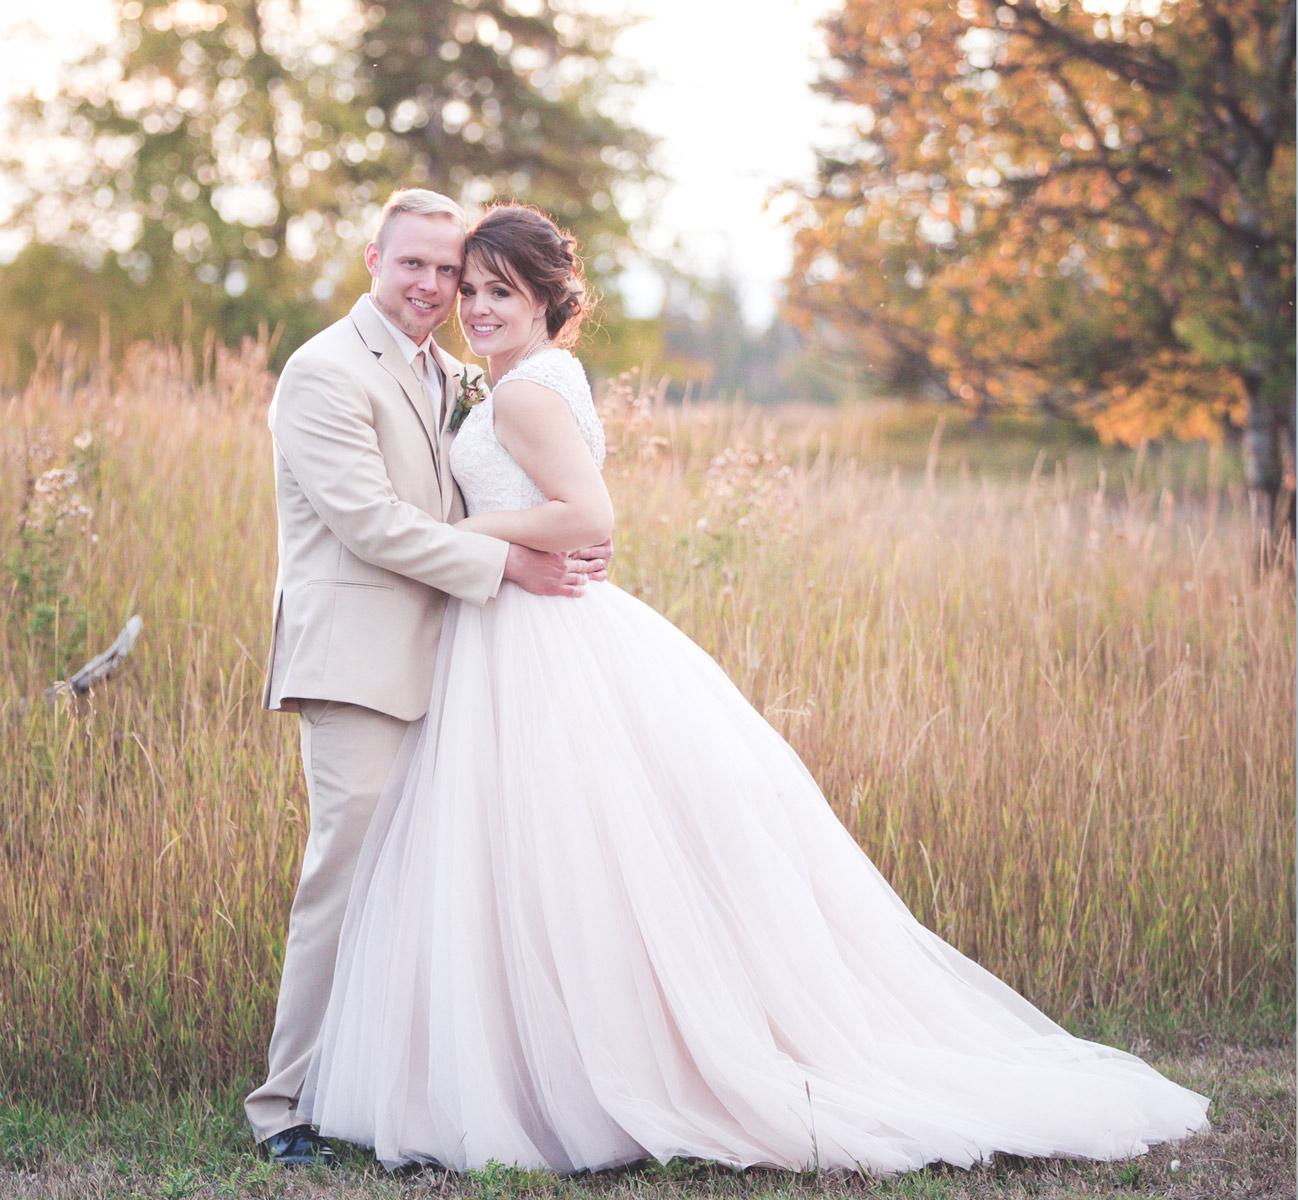 Jennifer_Mooney_Photo_Jessica_brandon_diamond_b_weddings3.jpg